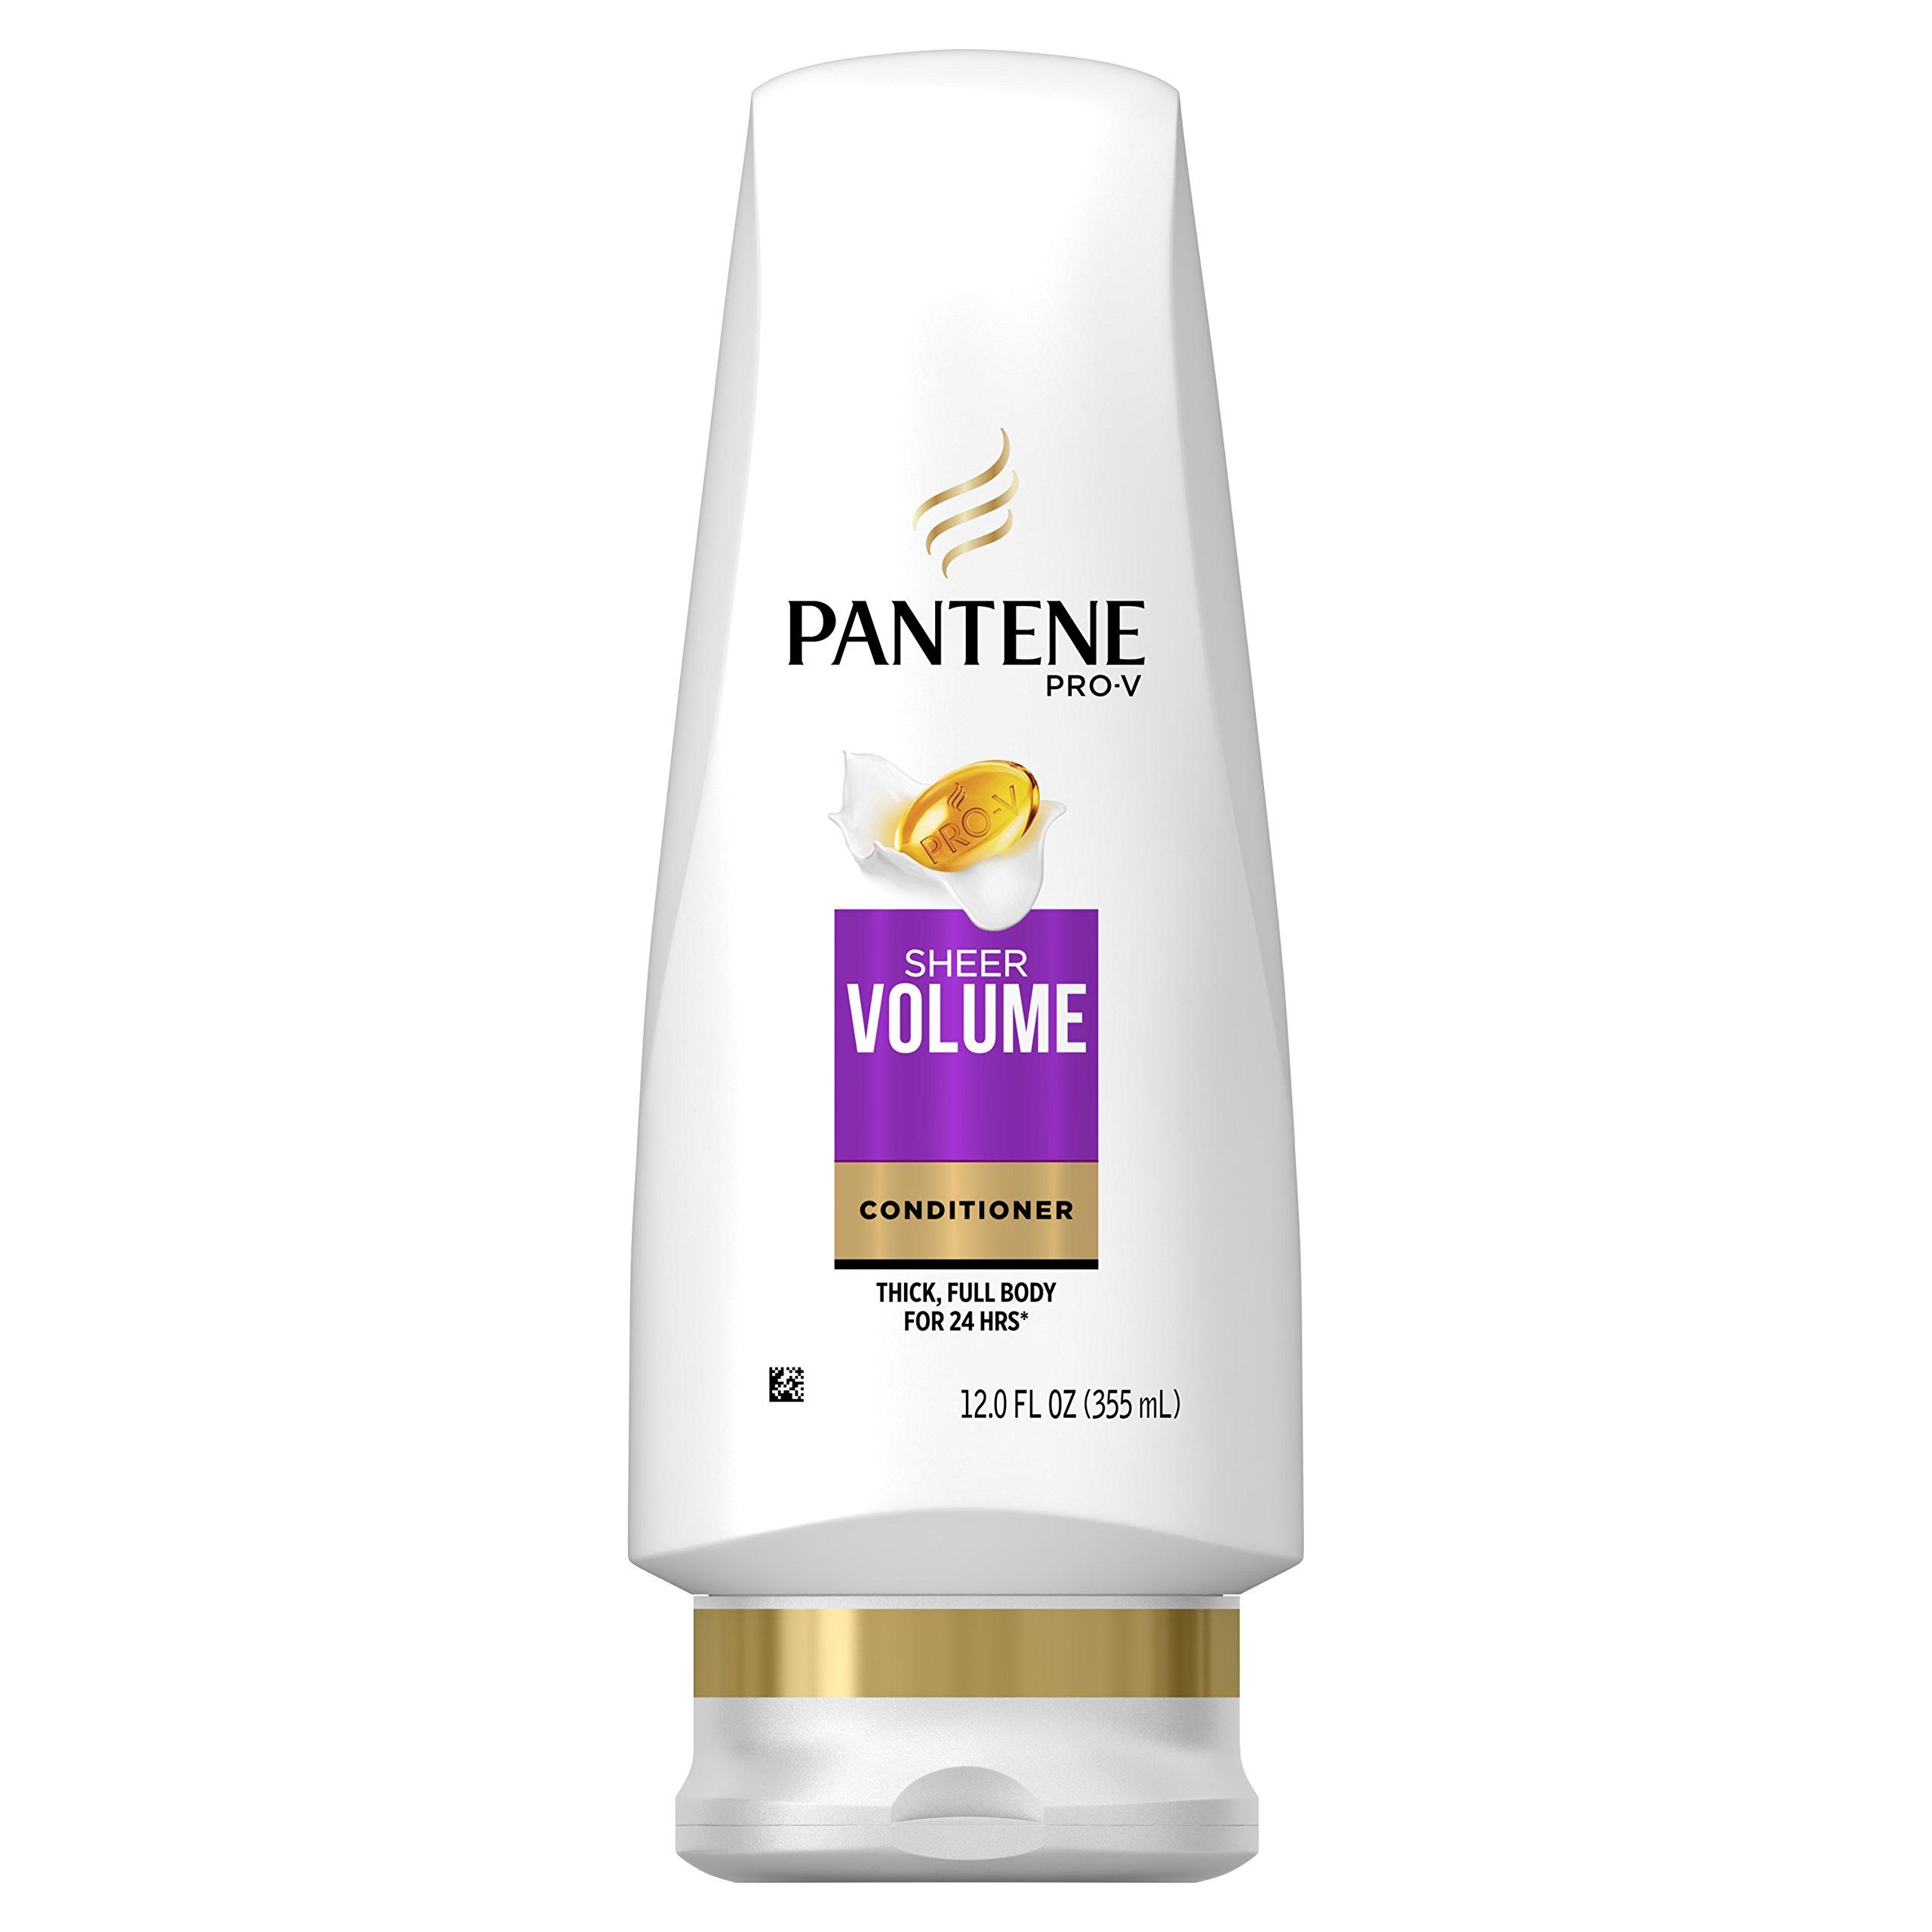 Pantene Pro-V Sheer Volume Conditioner, 12 fl oz (Packaging May Vary)